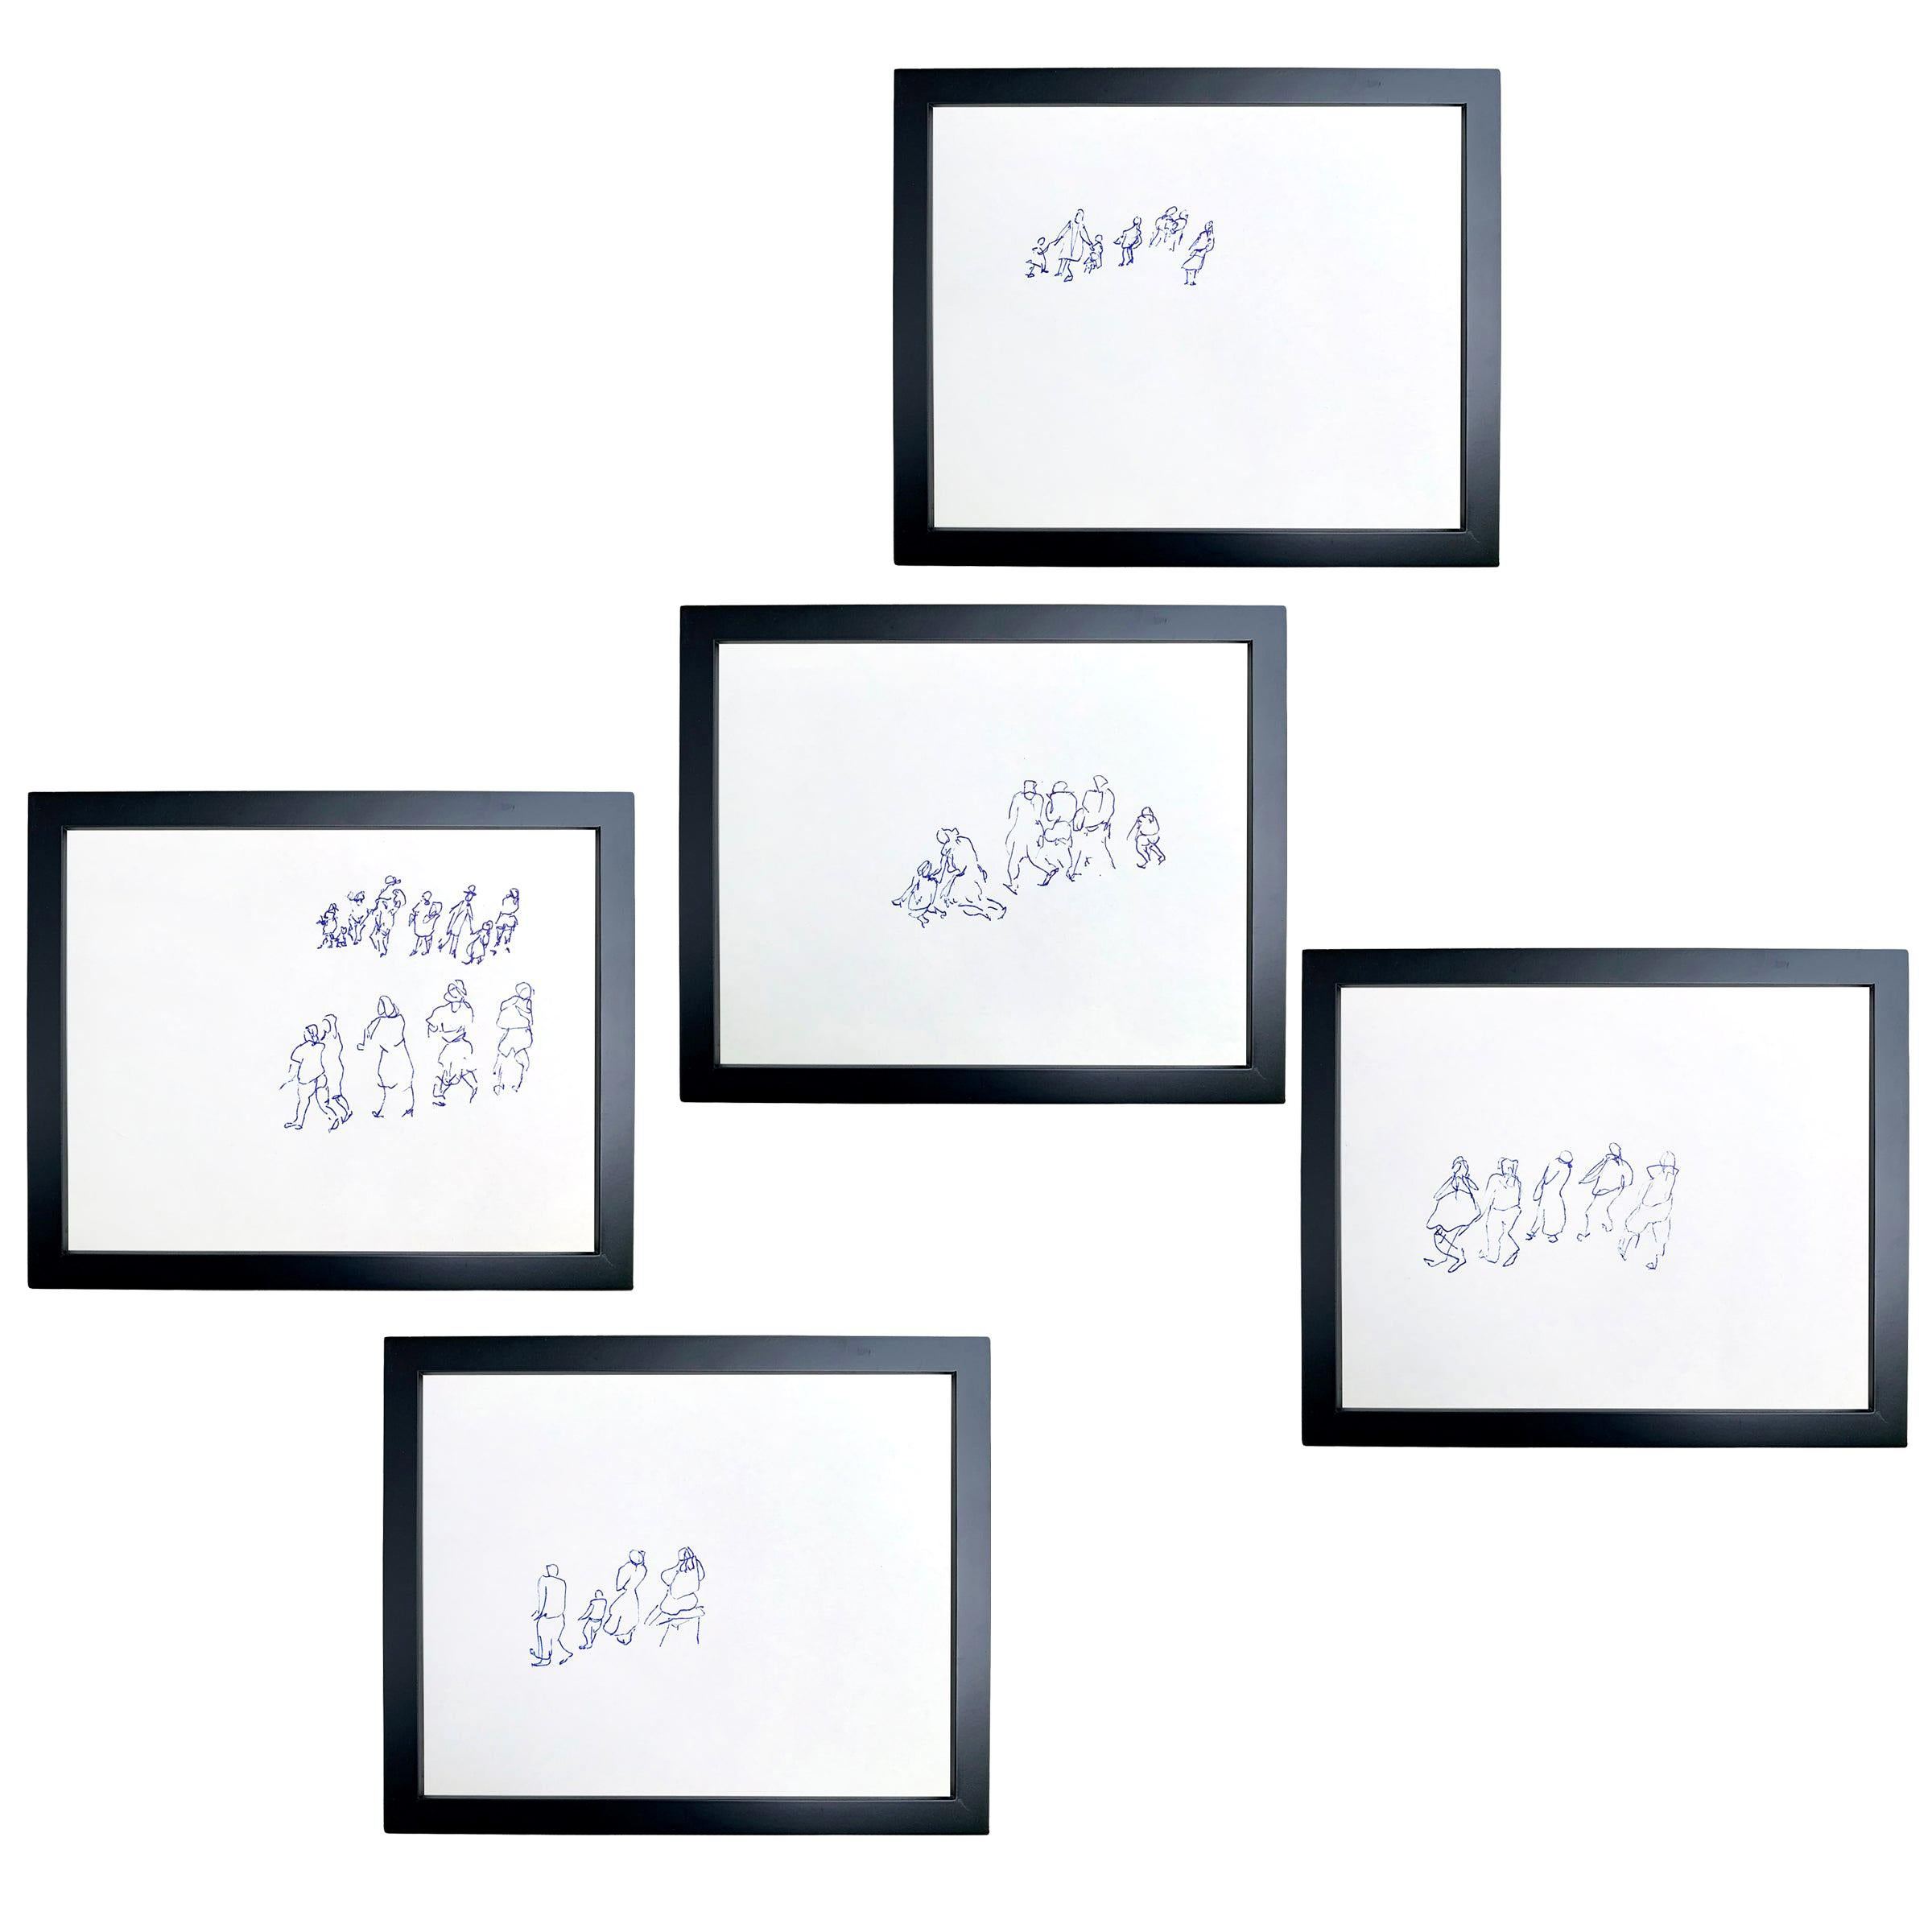 Set of Five Framed Gestural Figure Drawings by Paul Chidlaw